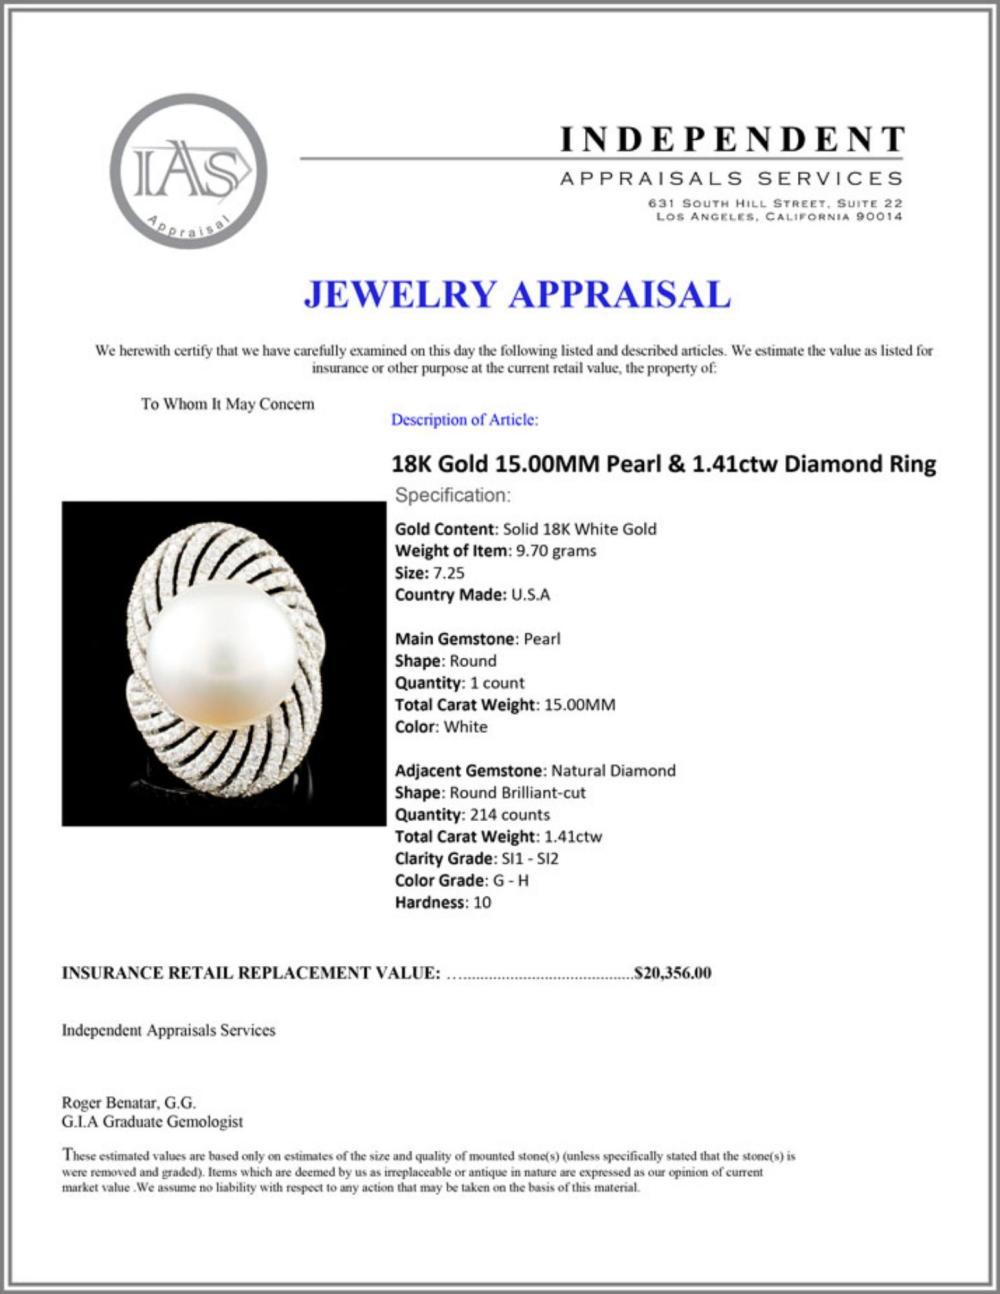 Lot 193: 18K Gold 15.00MM Pearl & 1.41ctw Diamond Ring